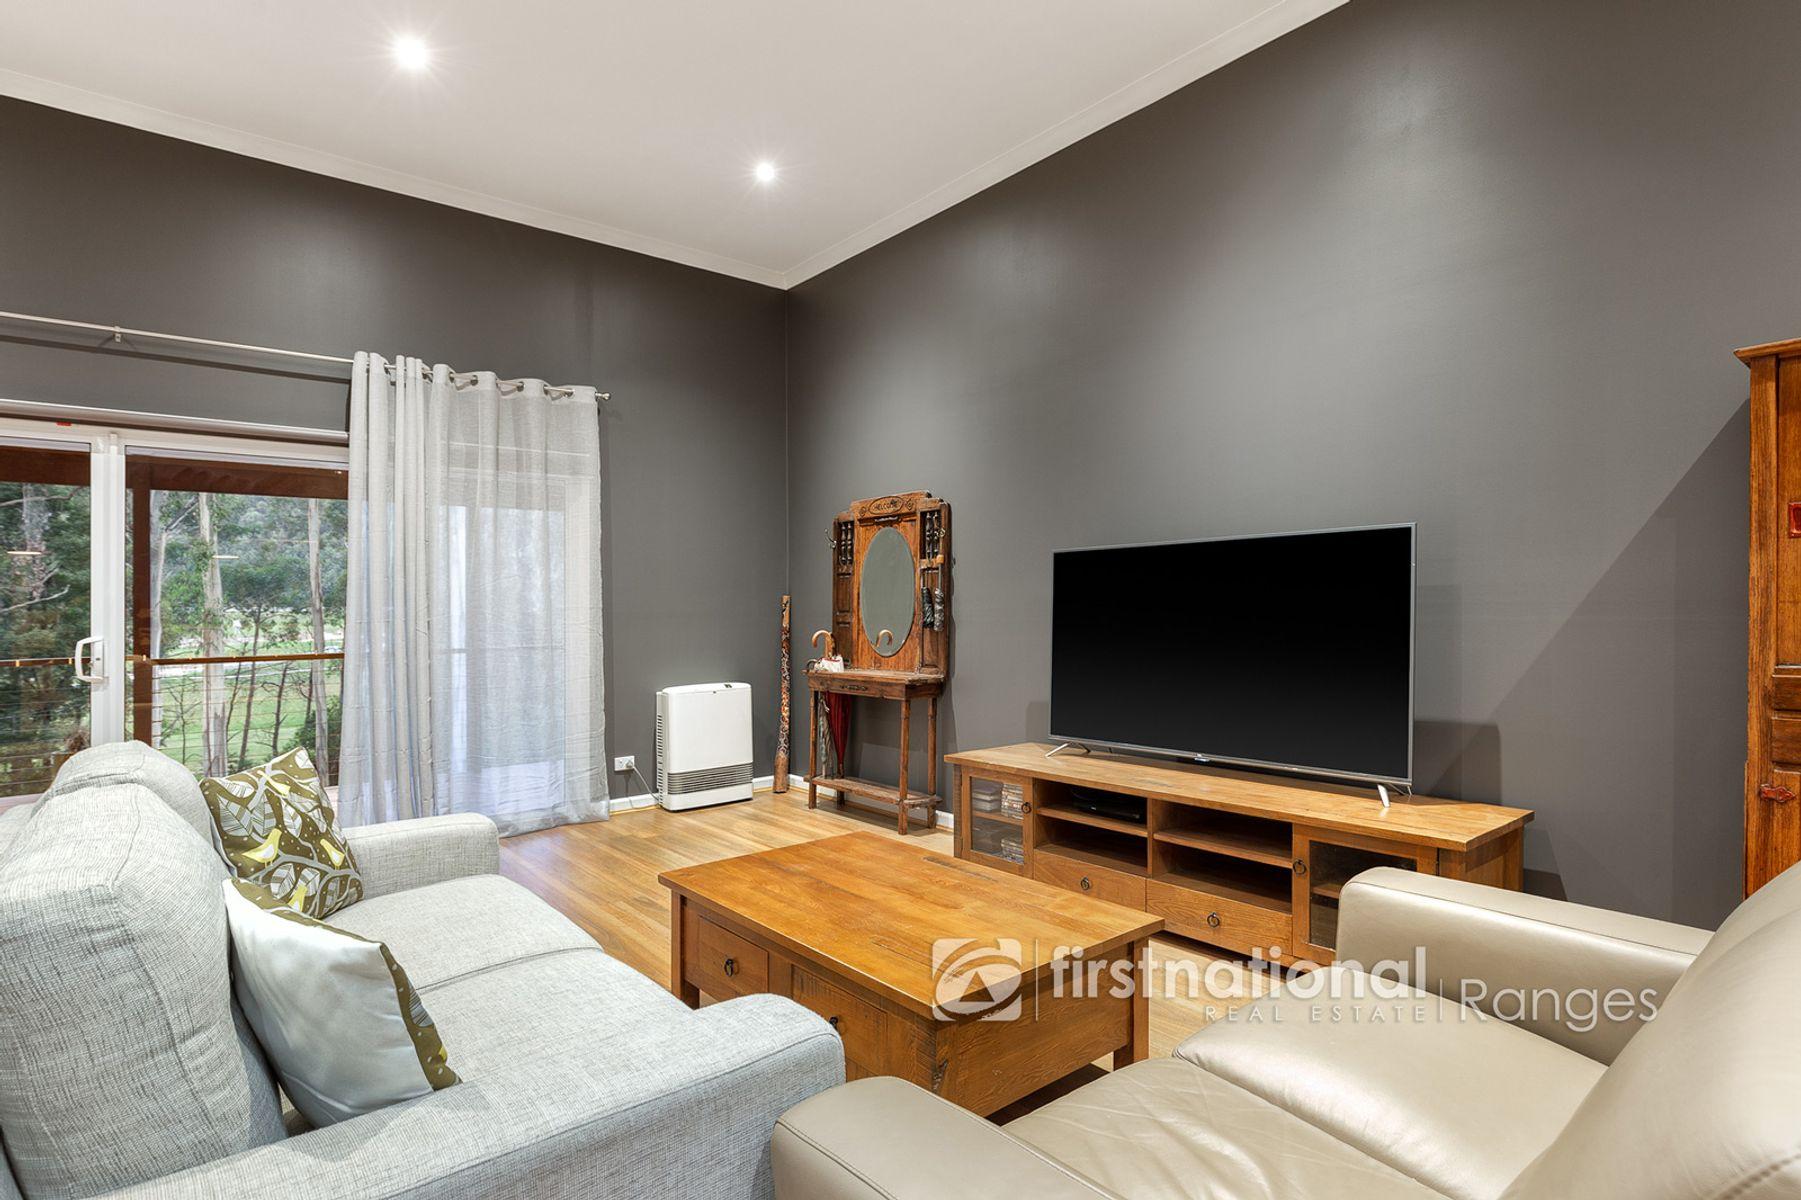 24a Neville Street, Cockatoo, VIC 3781